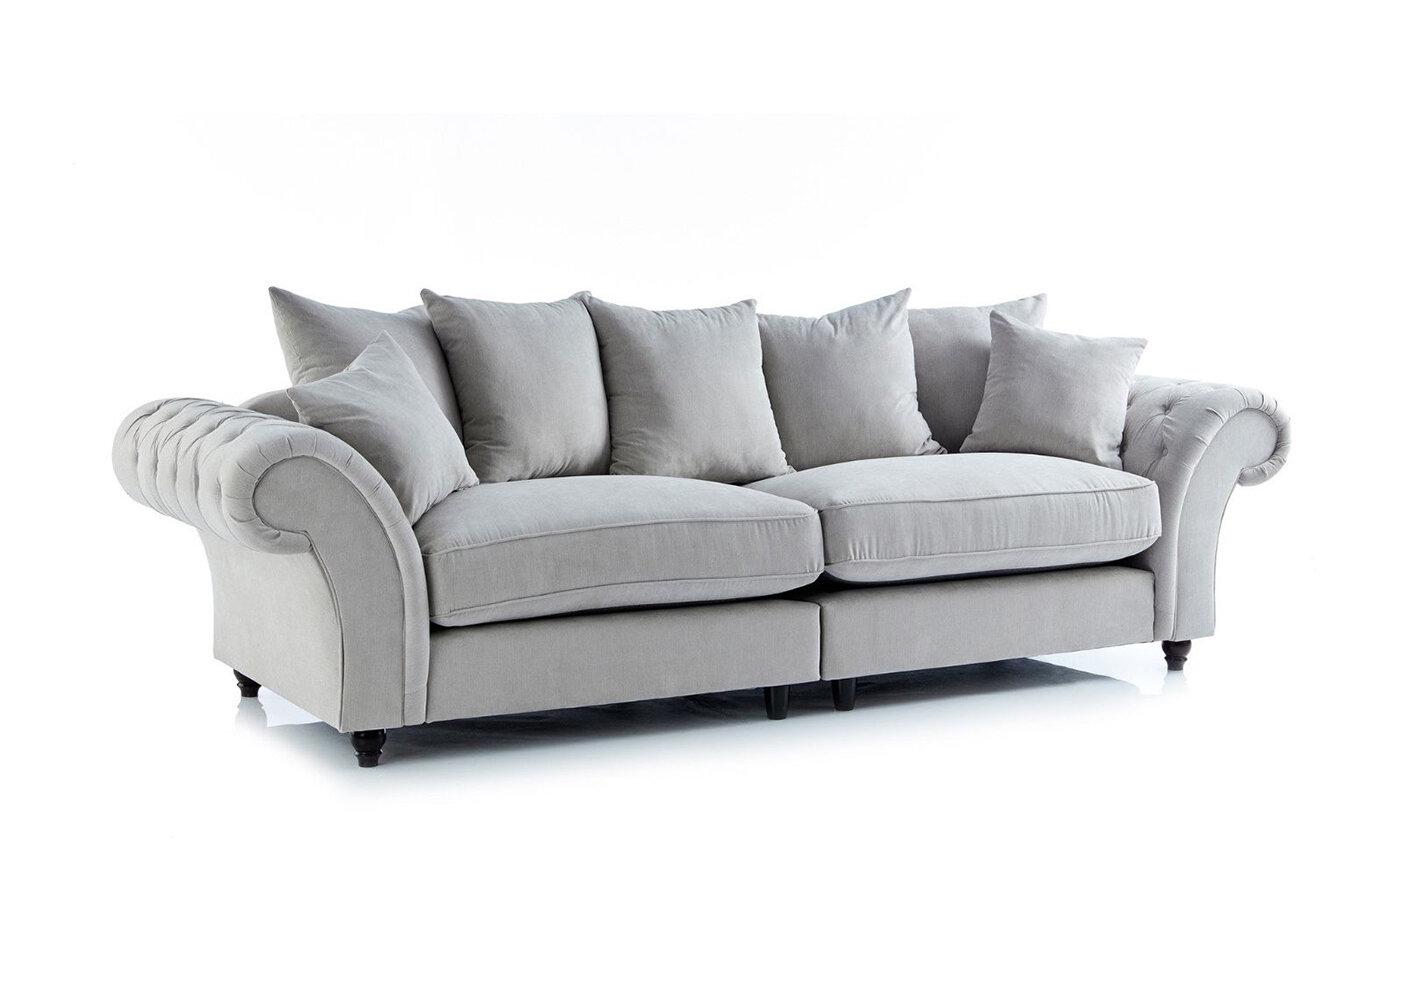 Peachy Gassville 4 Seater Sofa Best Image Libraries Sapebelowcountryjoecom